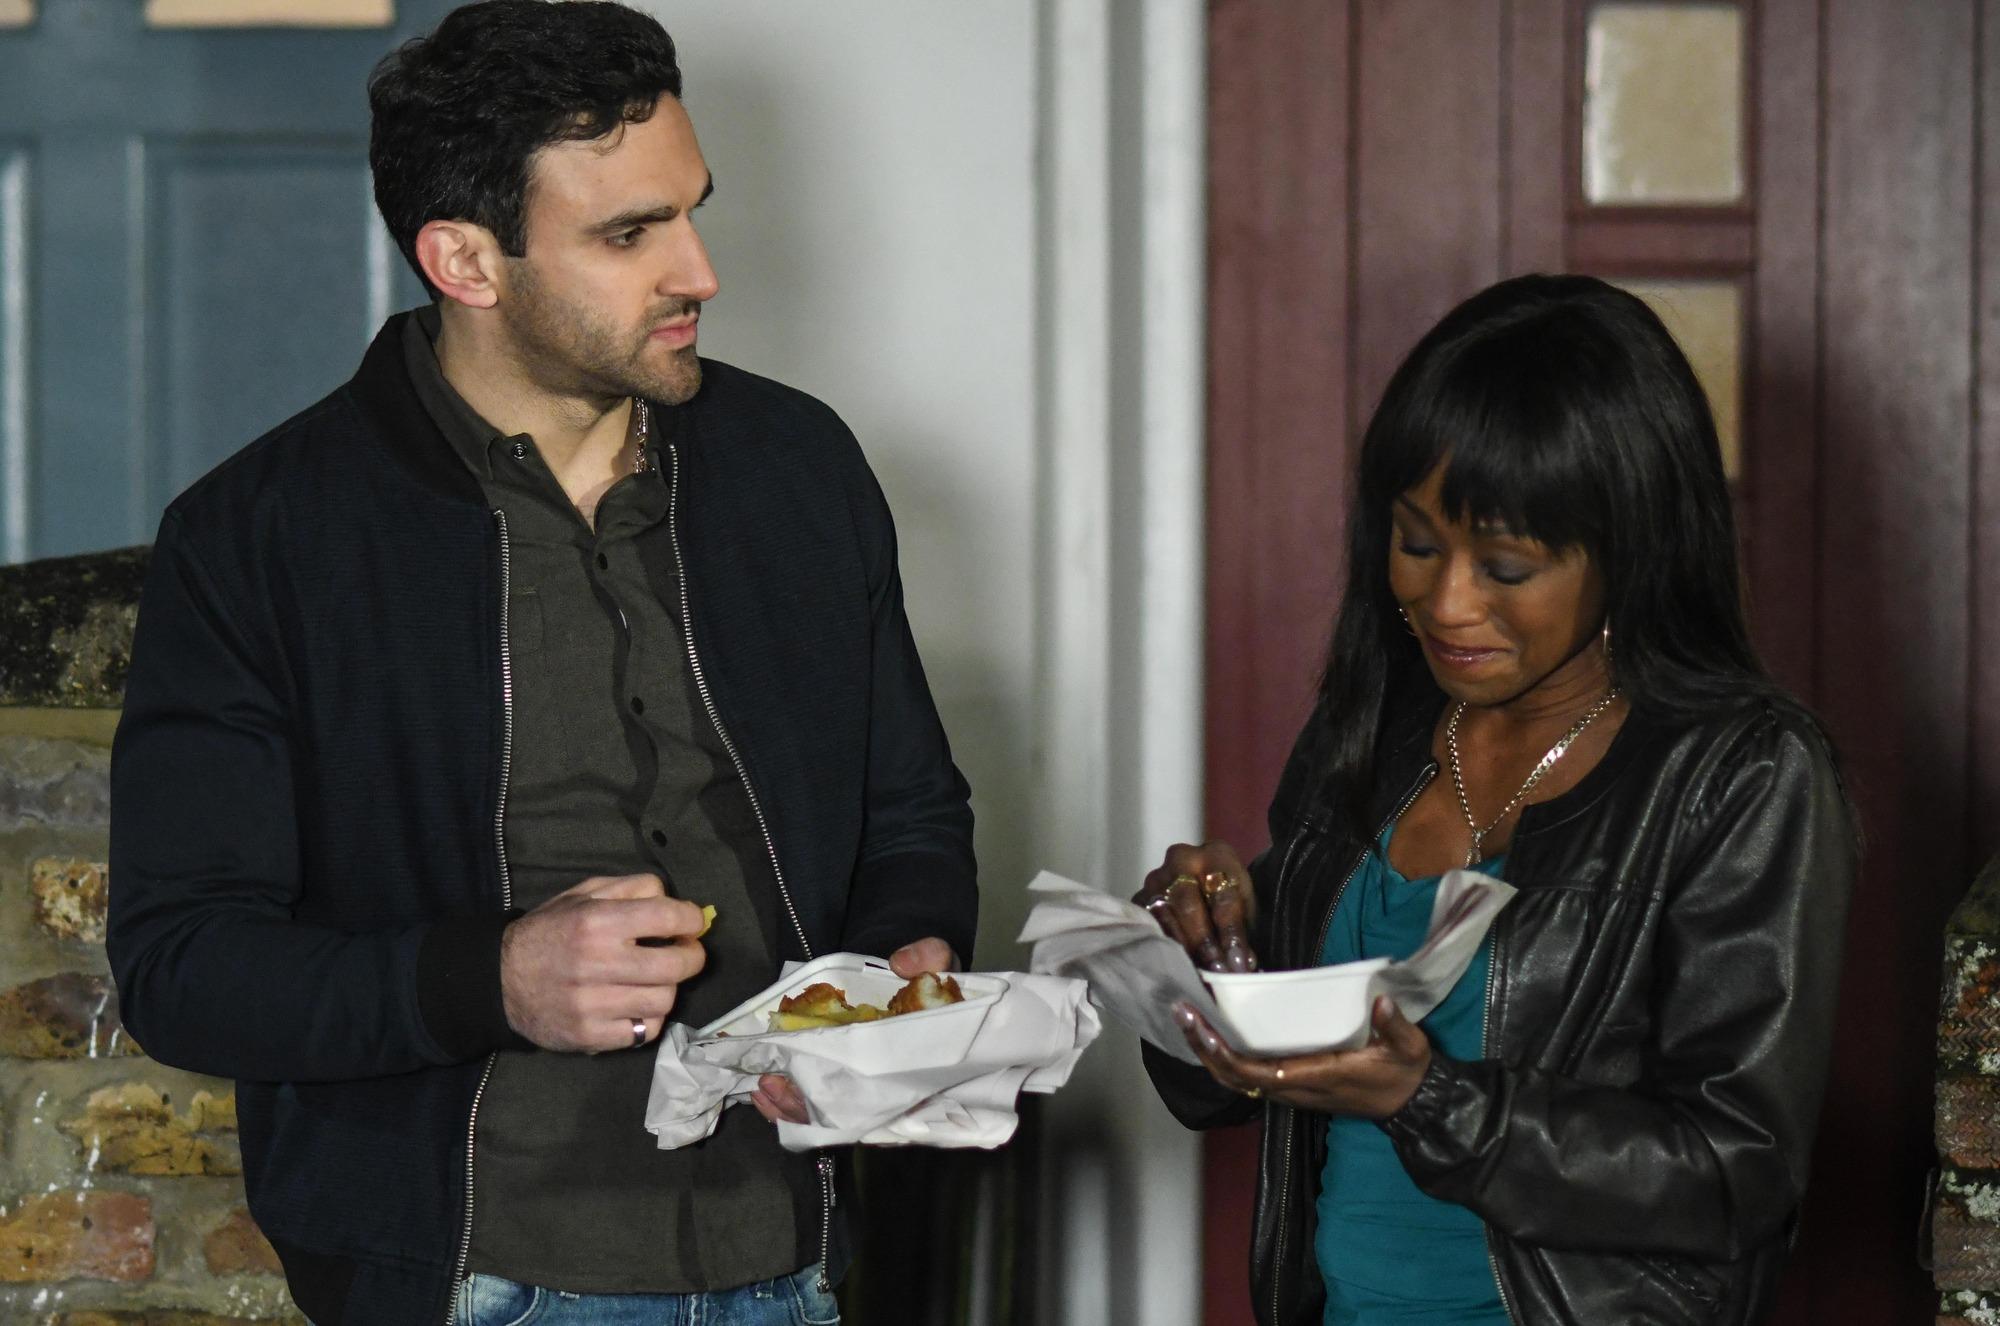 EastEnders spoilers: Reunion ahead for Denise Fox and Kush Kazemi?